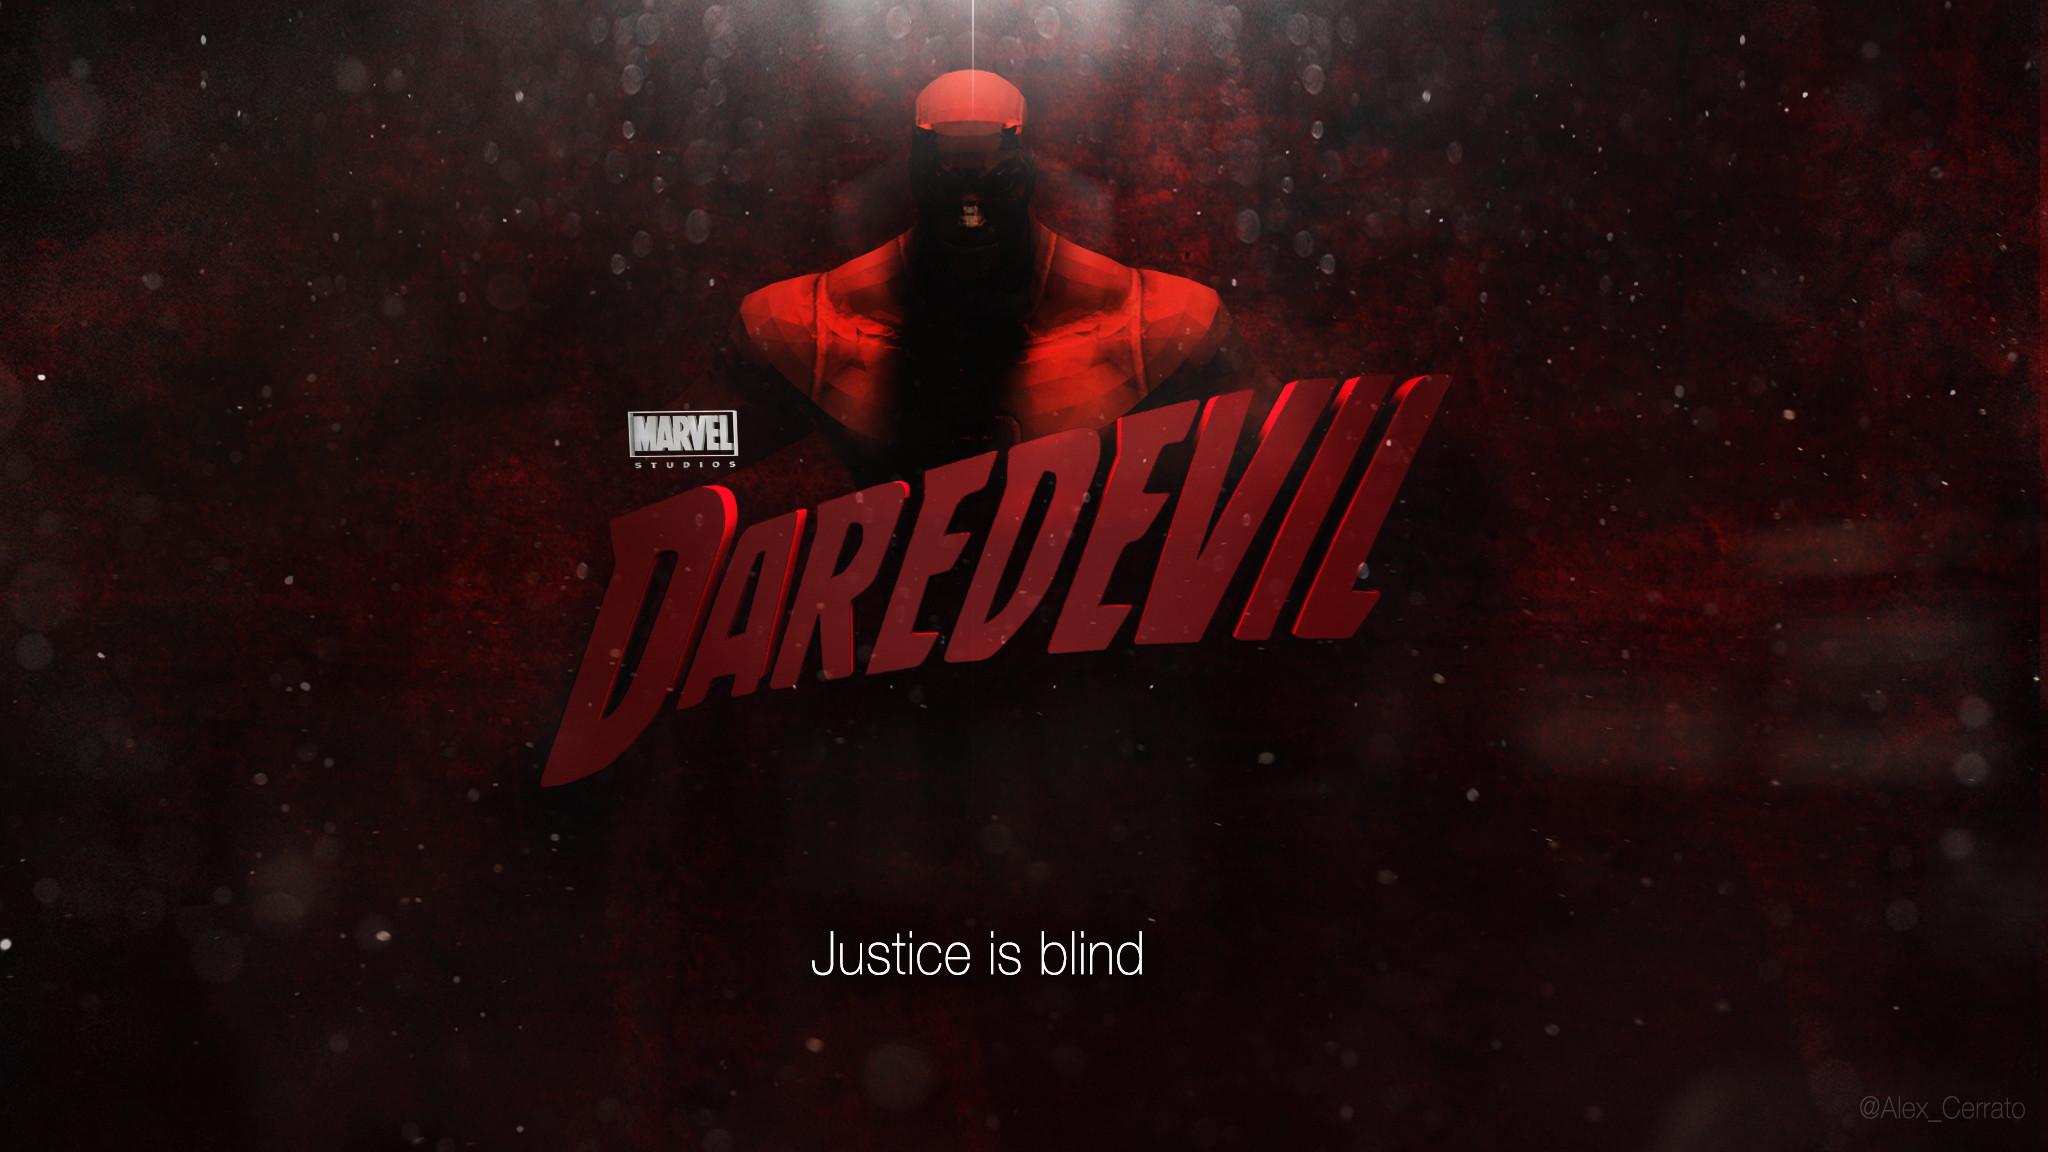 Daredevil 2015 TV Series wallpapers (6 Wallpapers)